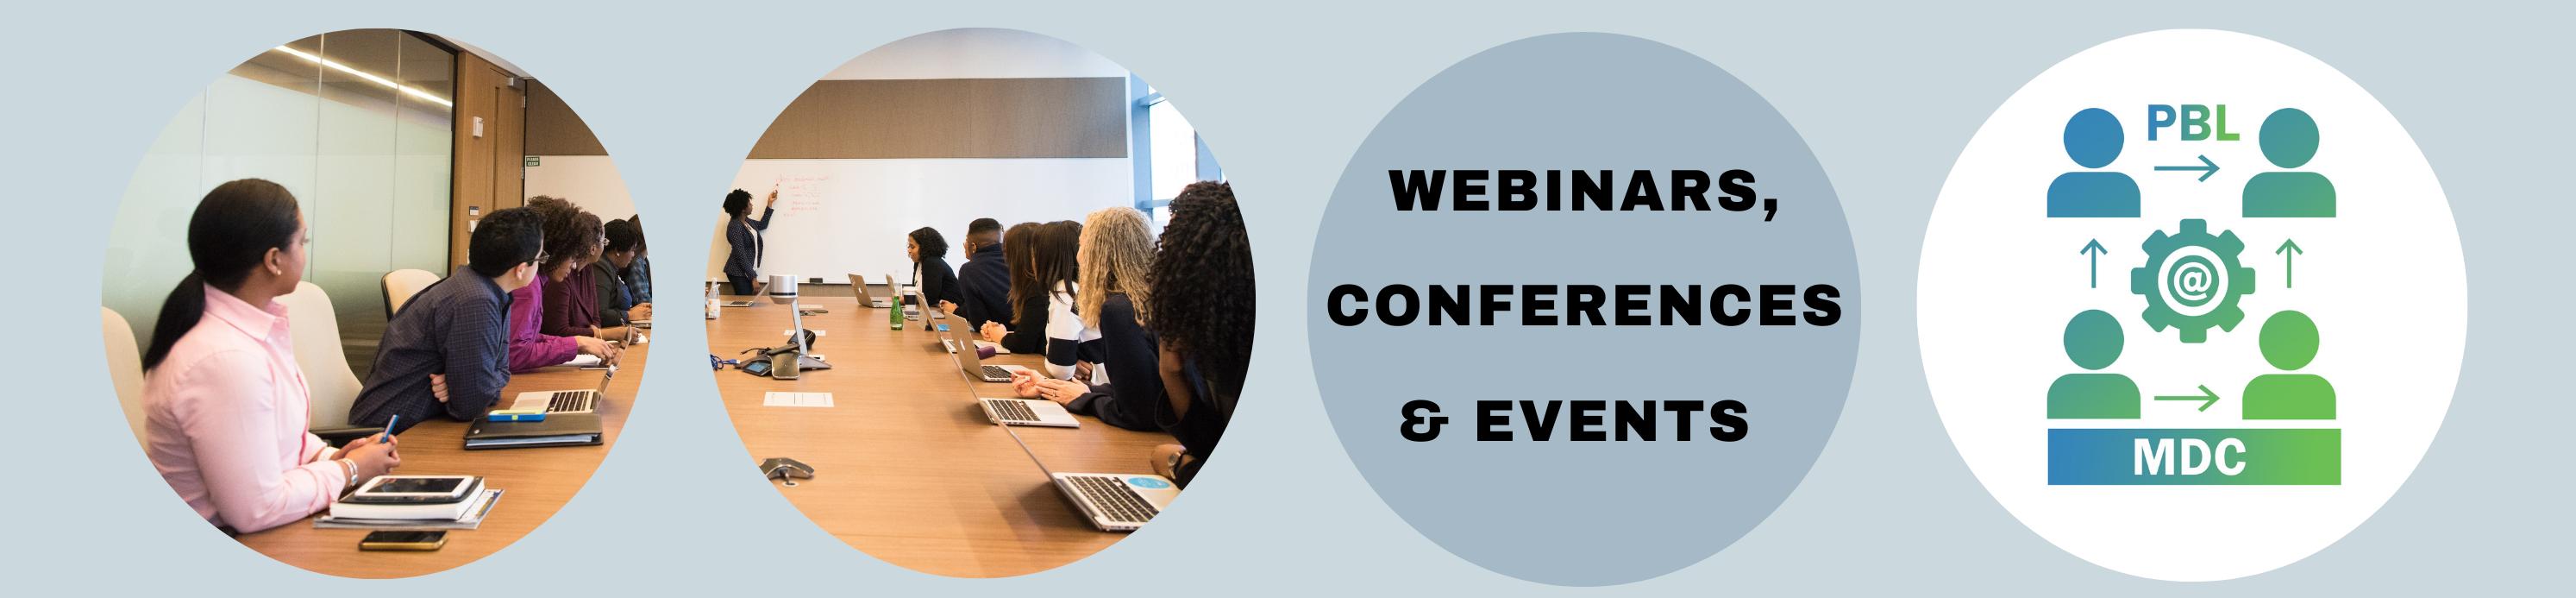 Webinars, Conferences & Events